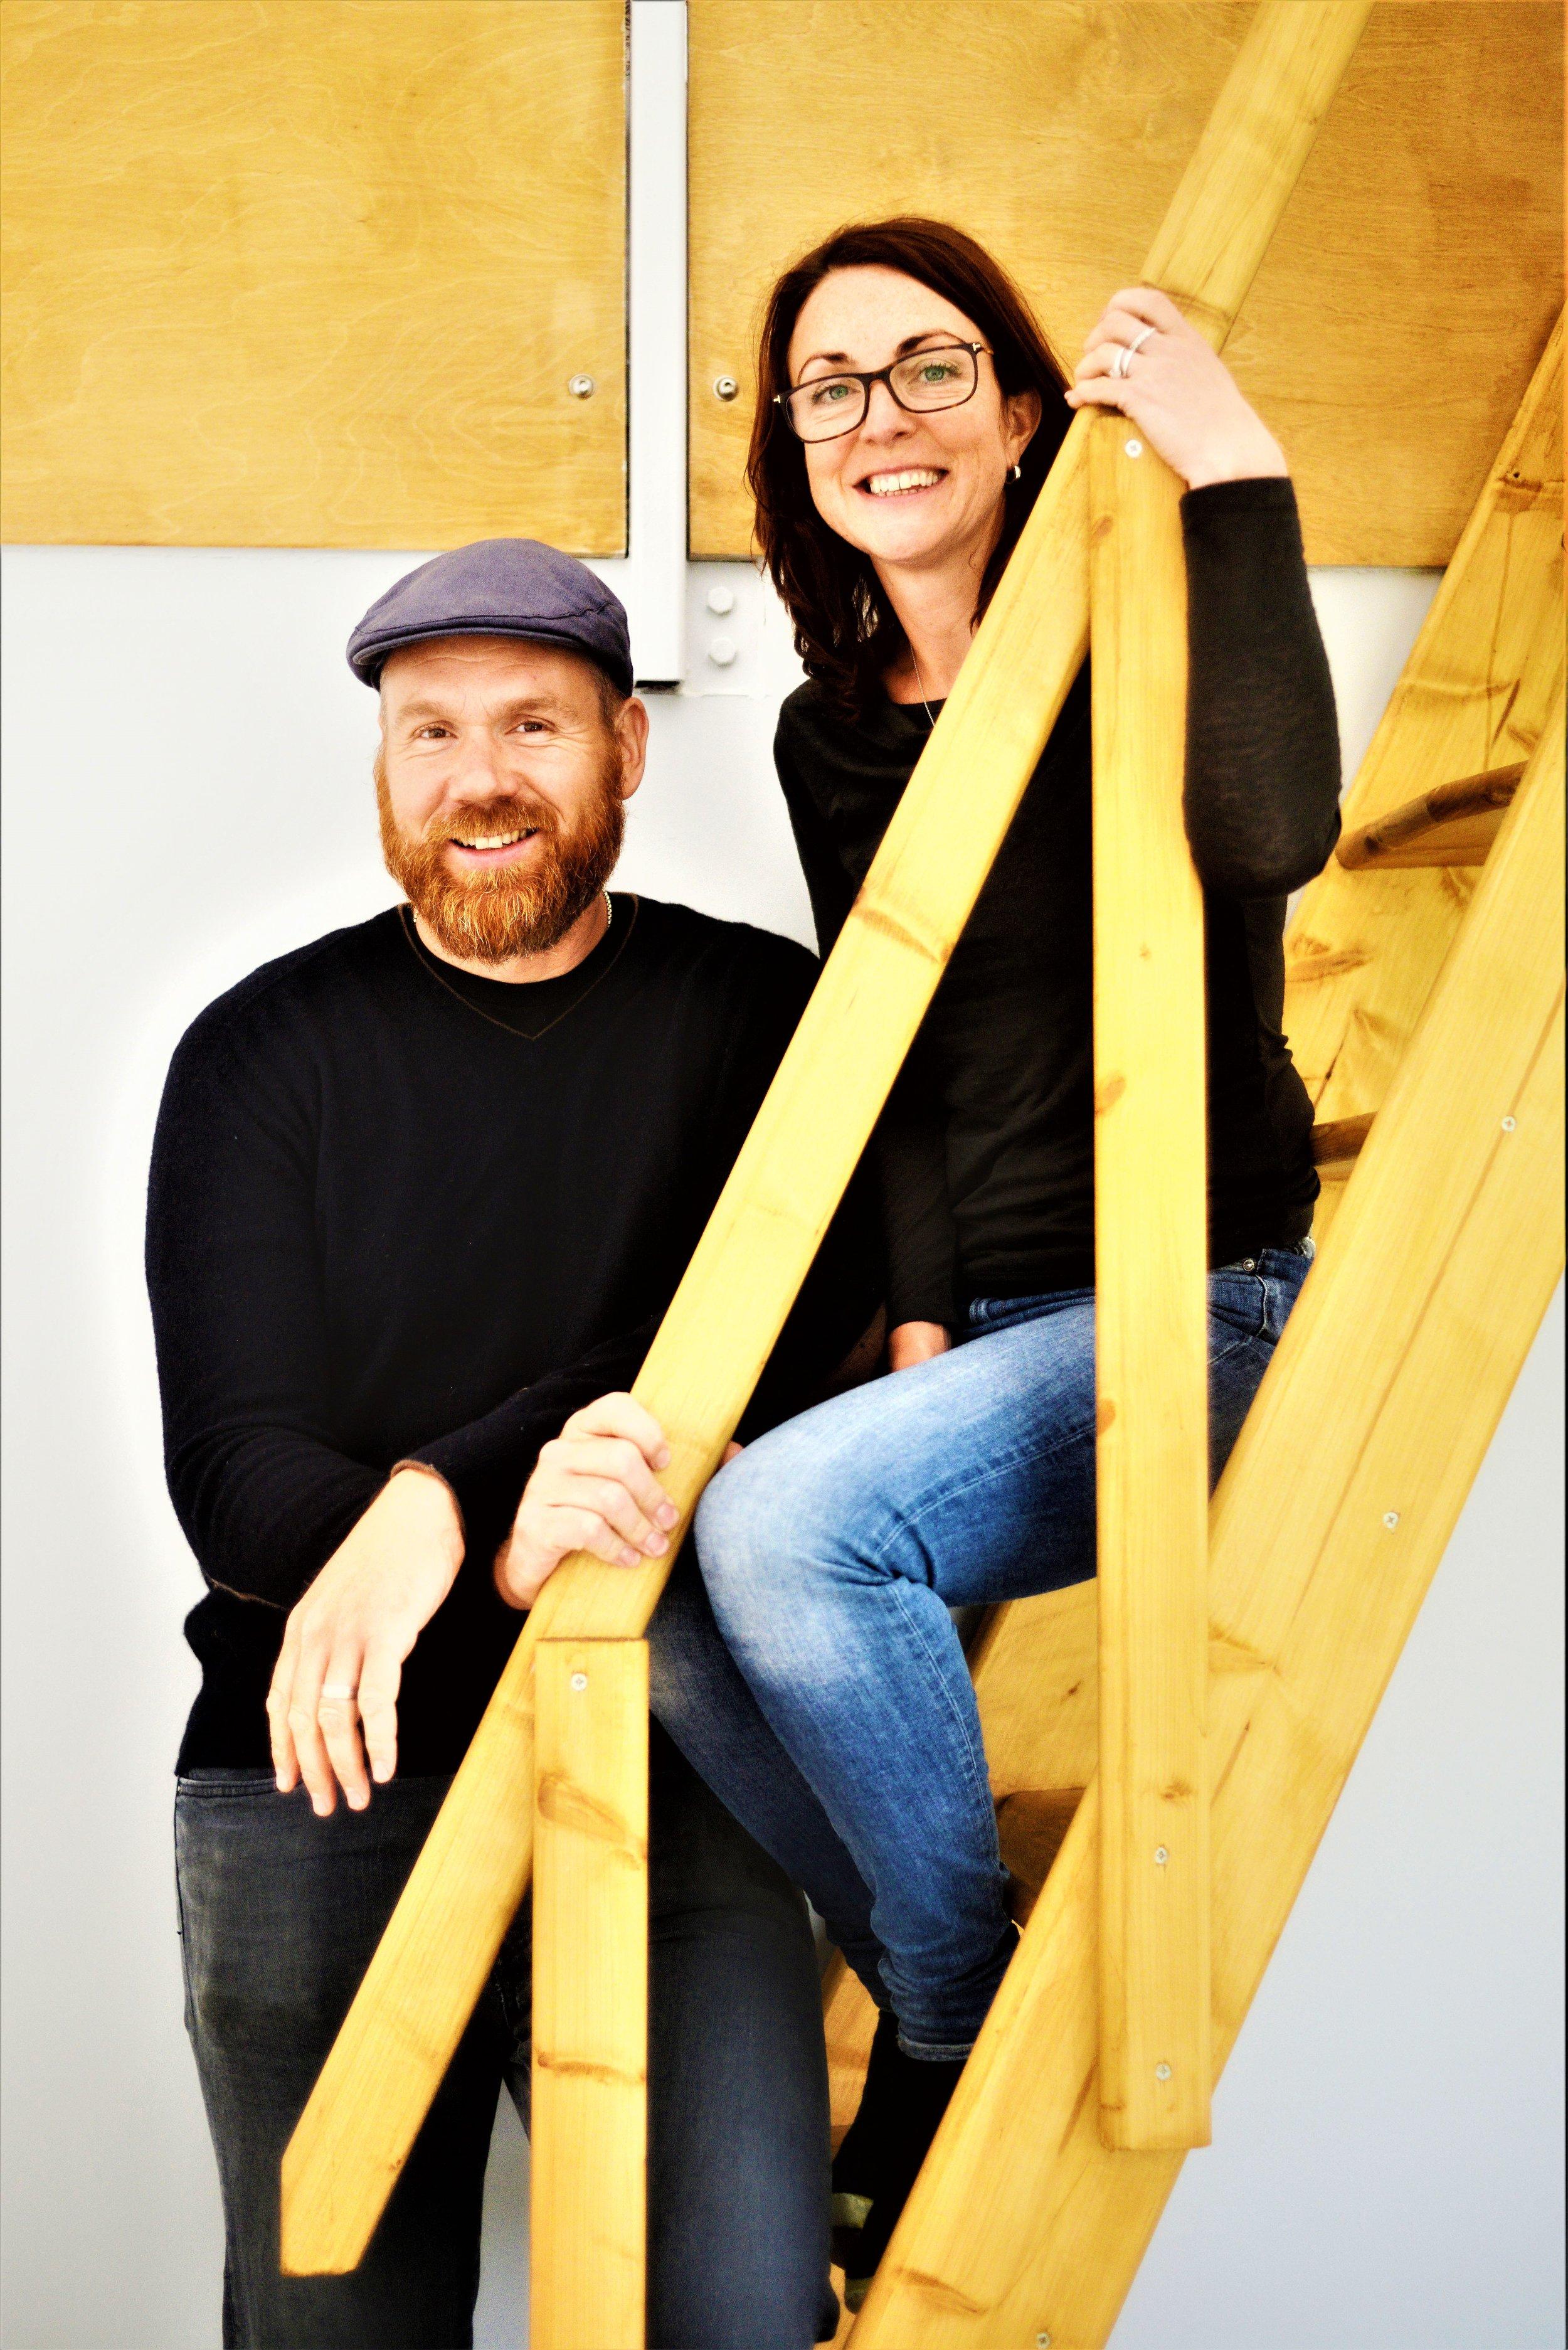 The 'secret staircase' - - Rutland Creative